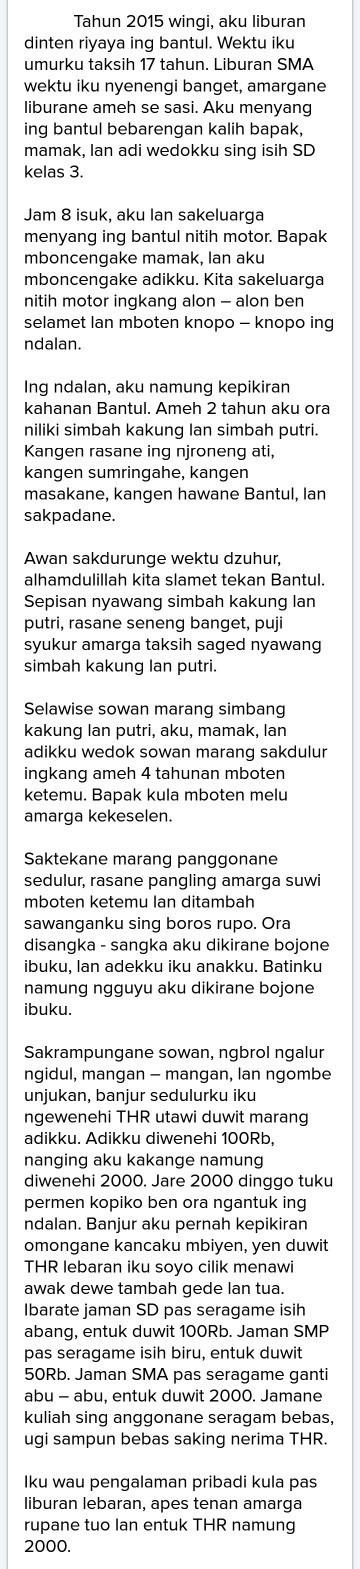 Cerita Liburan Bahasa Jawa Krama : cerita, liburan, bahasa, krama, Cerita, Pengalaman, Bahasa